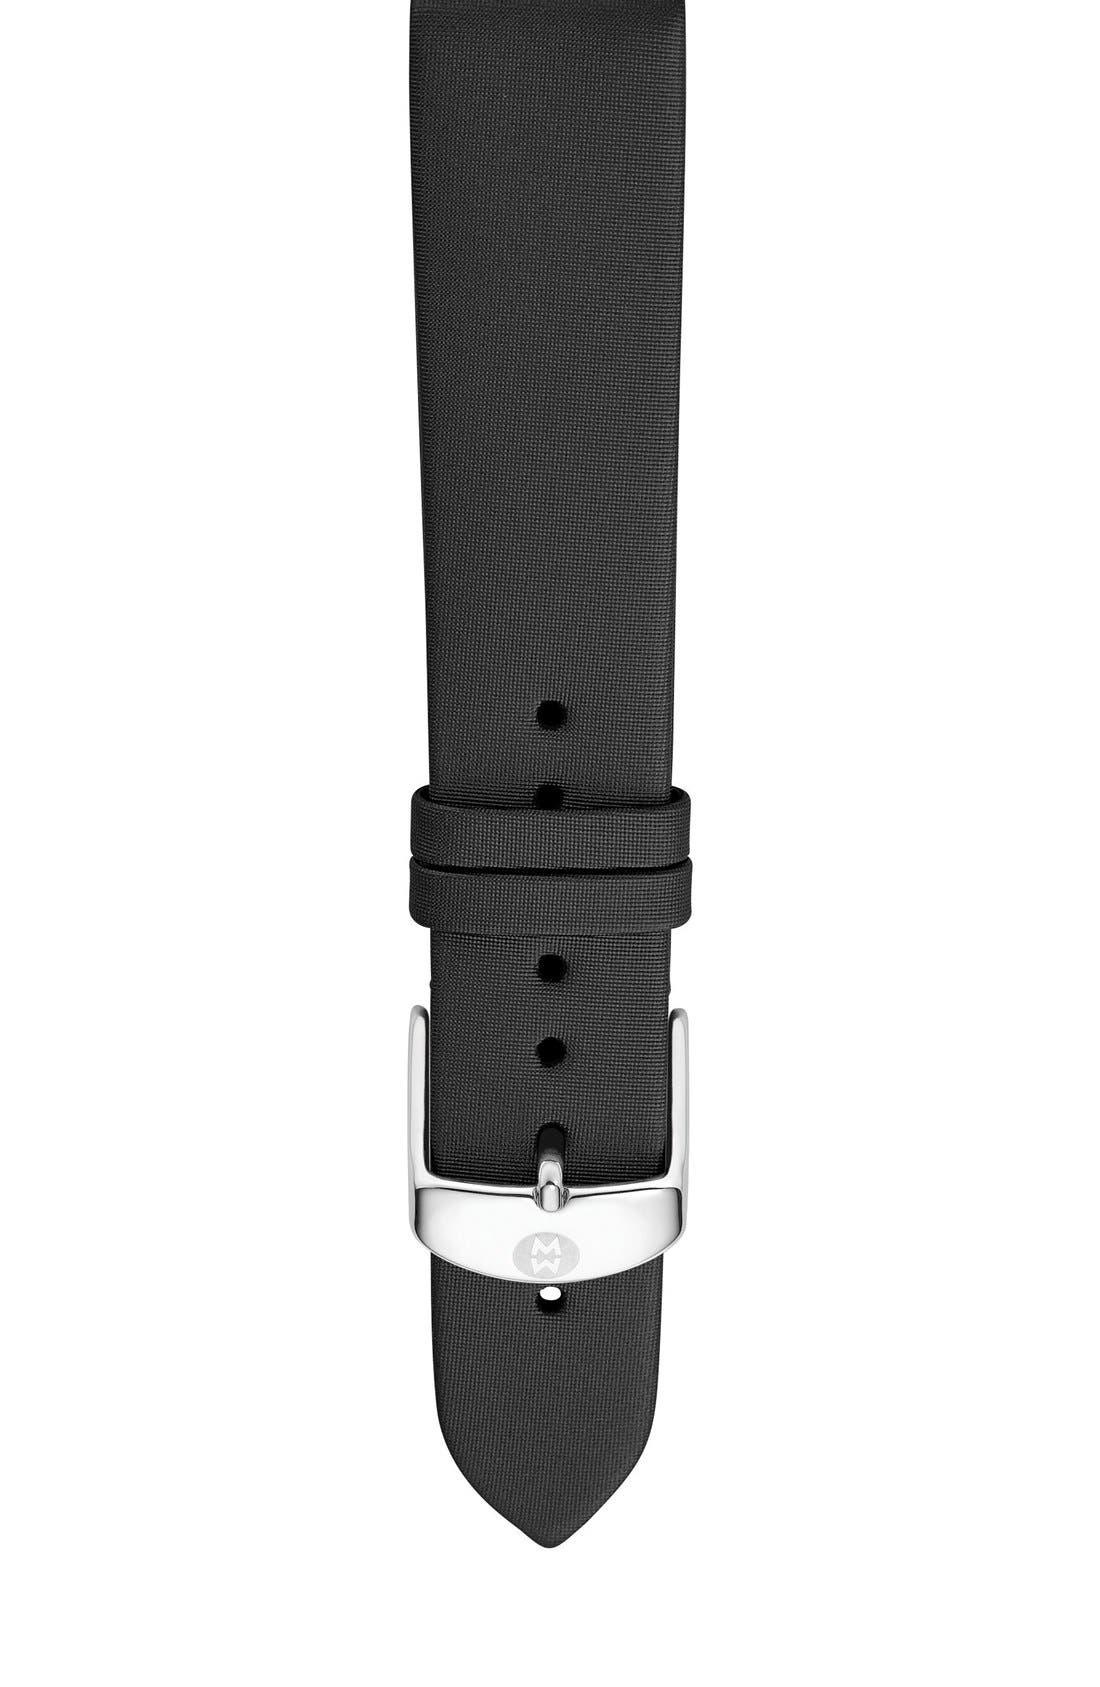 16mm Satin Watch Strap,                         Main,                         color, Black